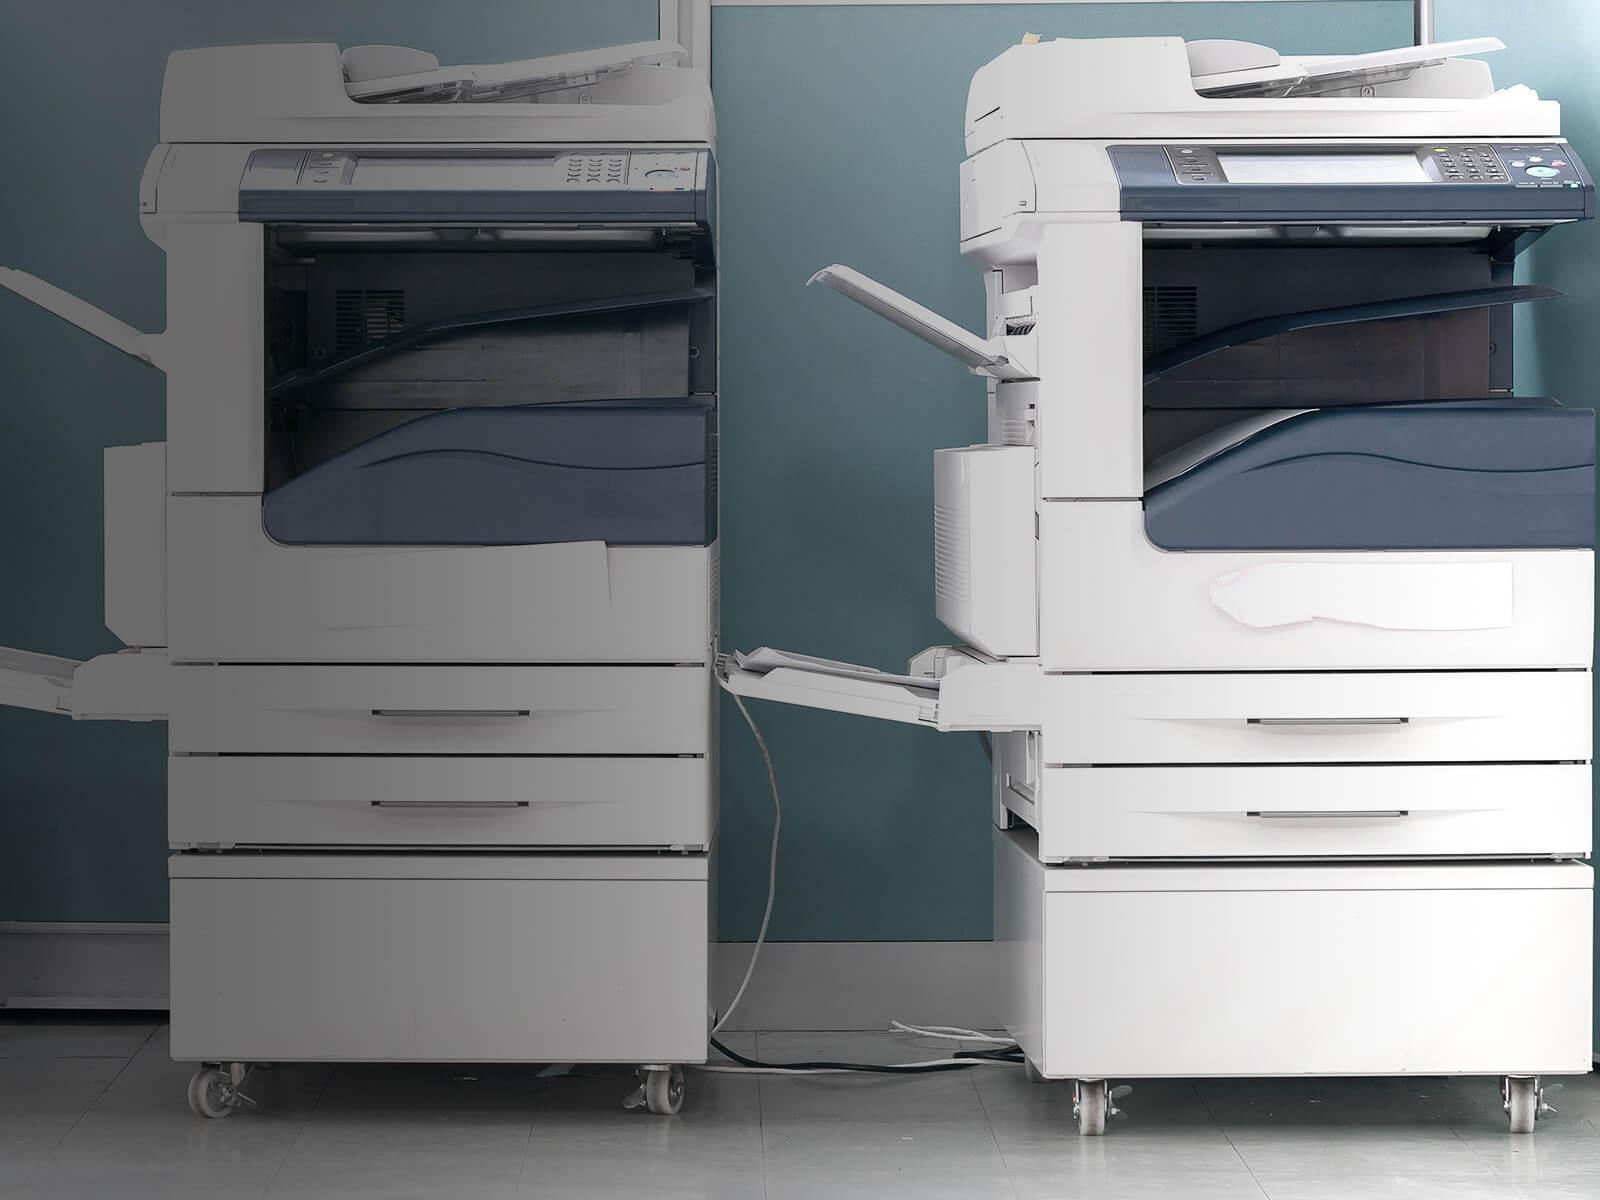 Two multi-function printers